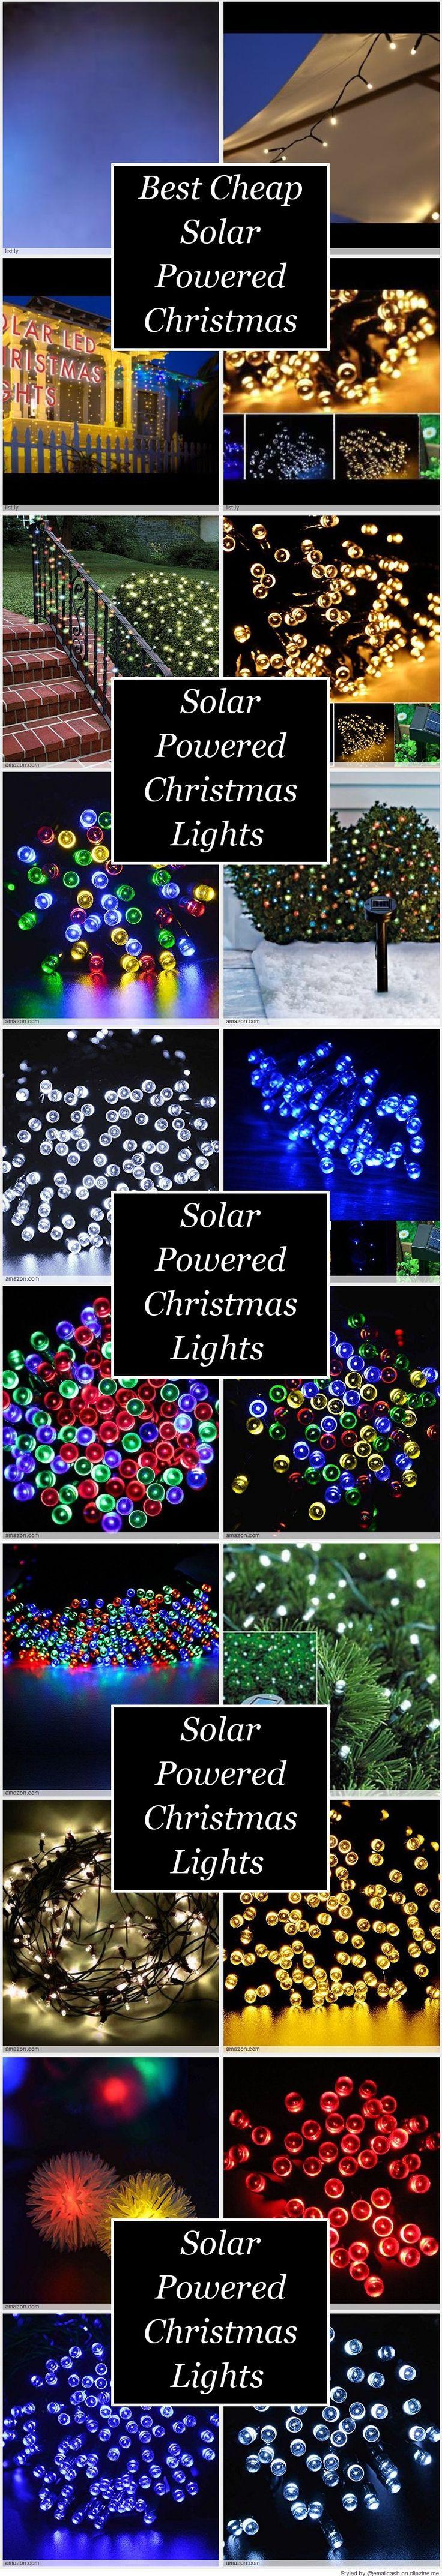 Best 25+ Solar powered christmas lights ideas on Pinterest | Solar ...